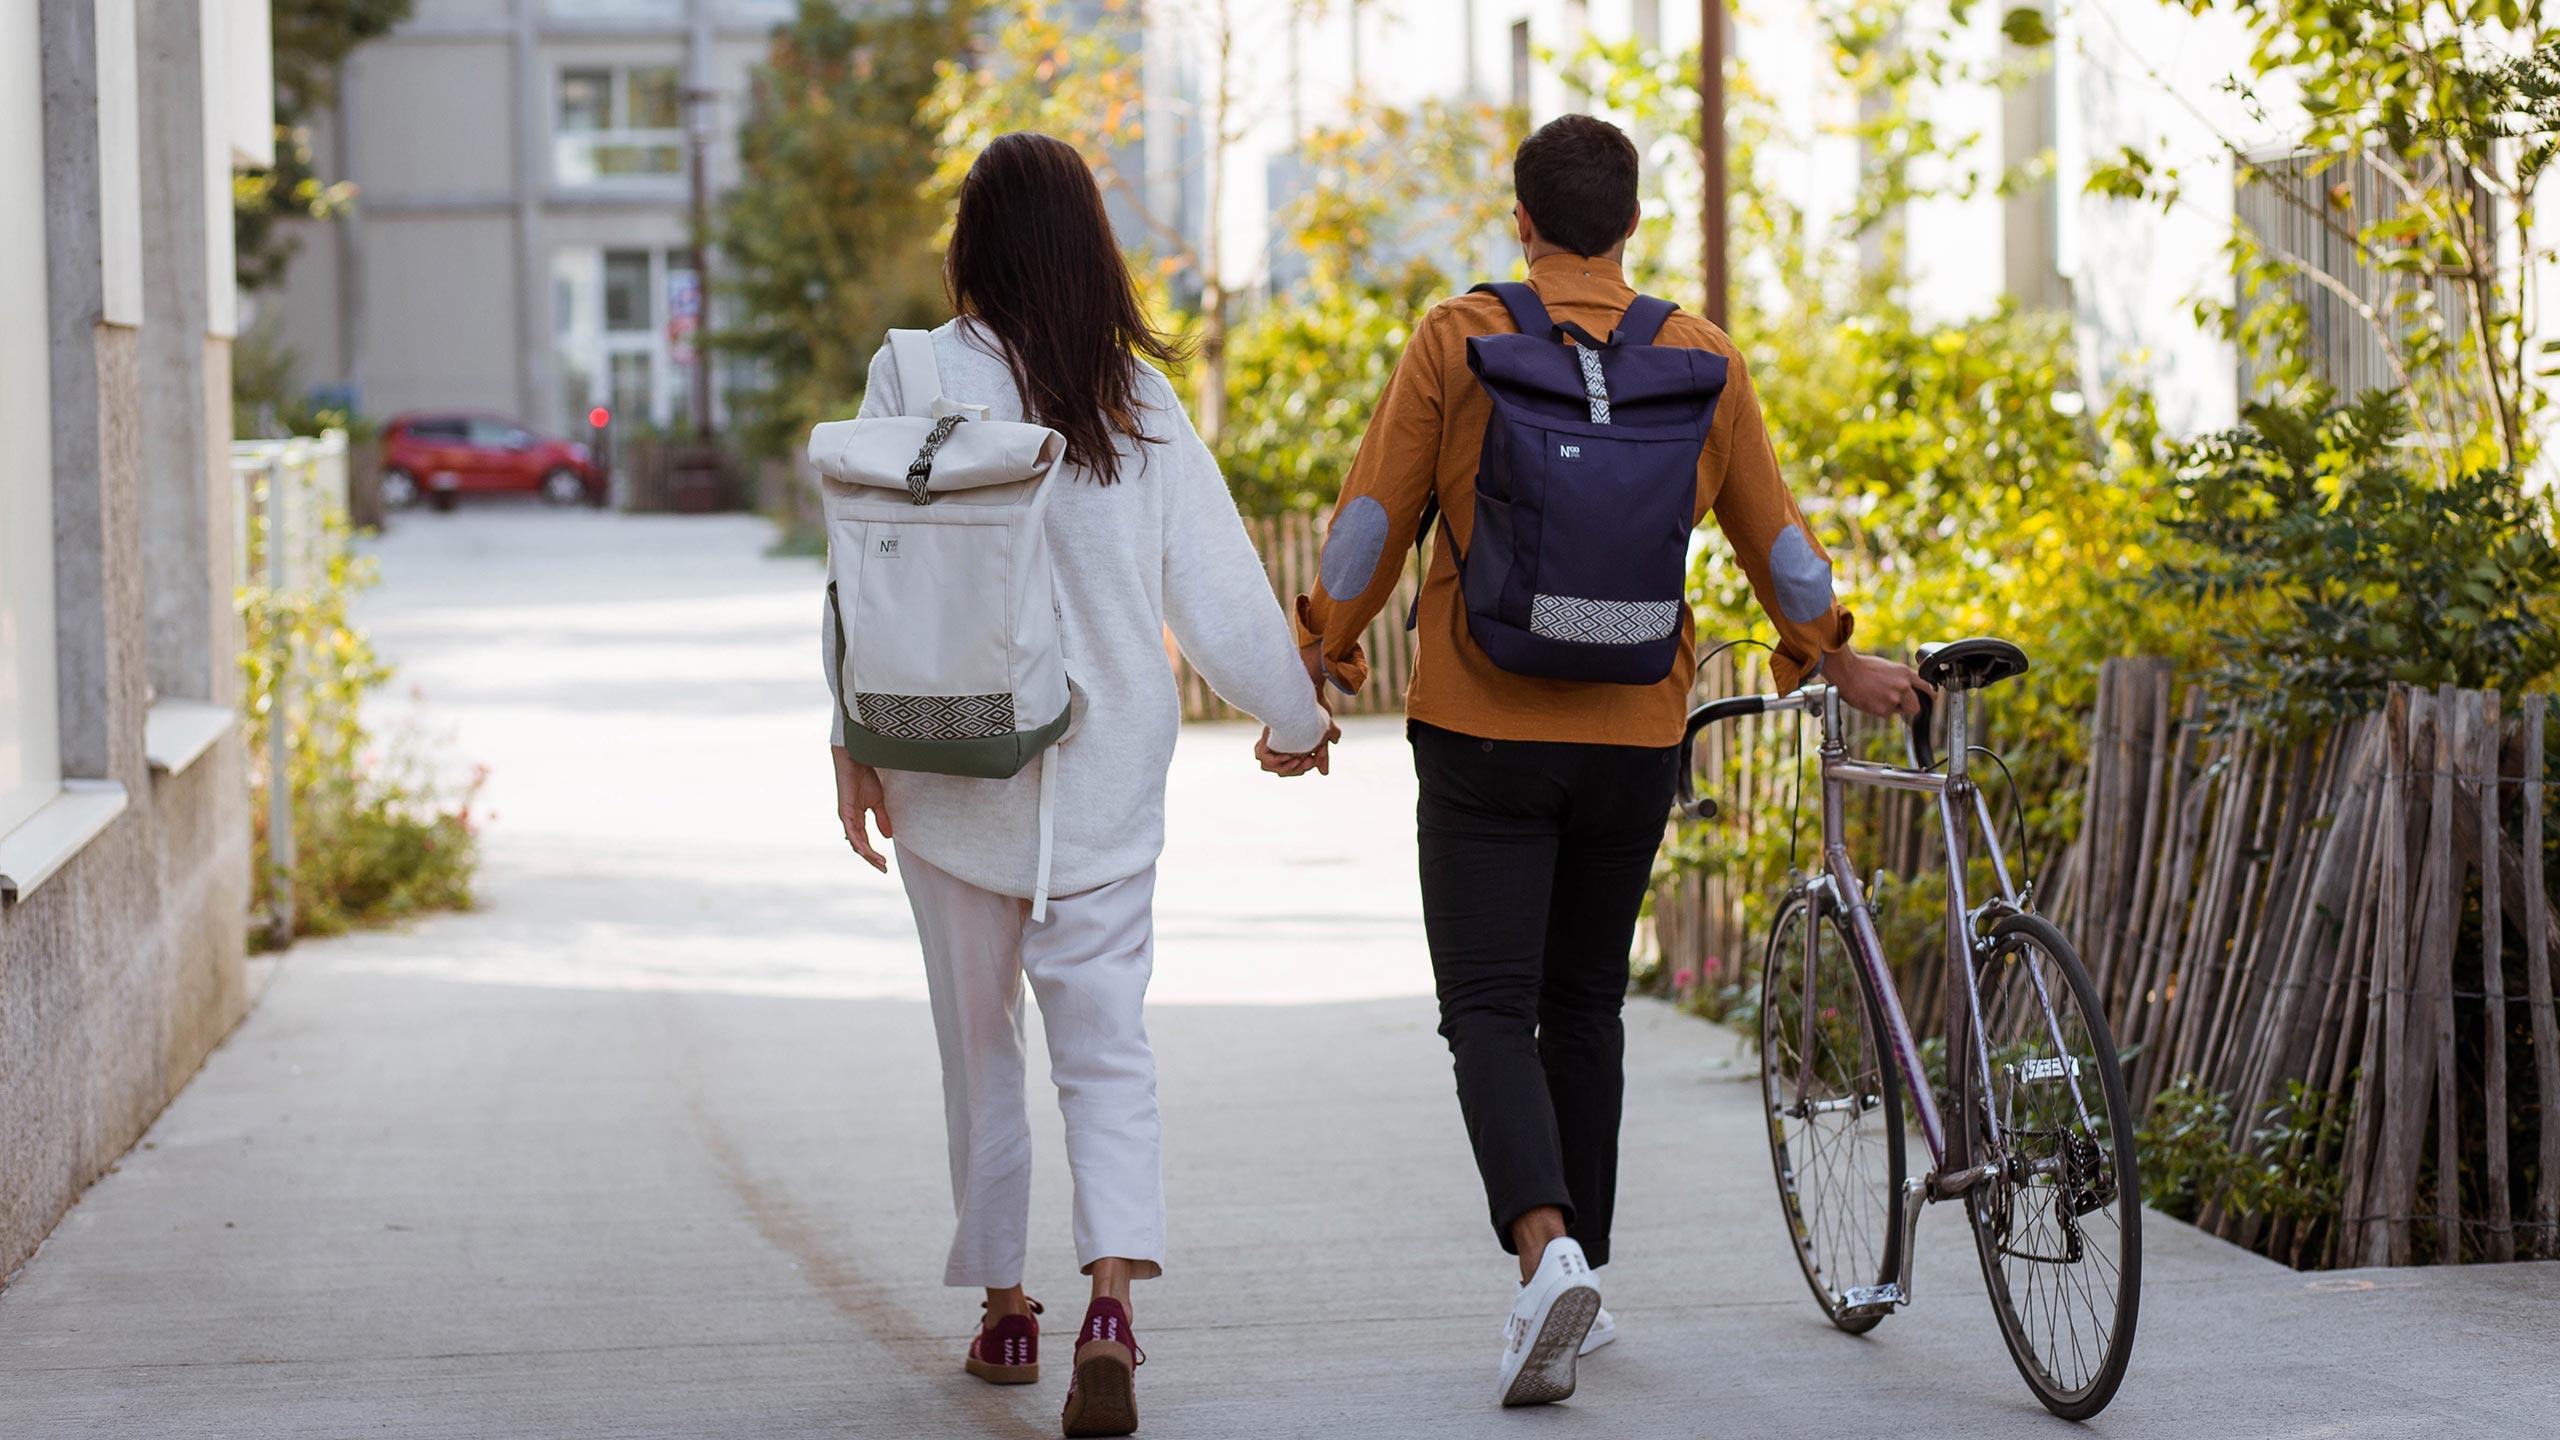 antoine-cornou-ngo-backpack-full-2